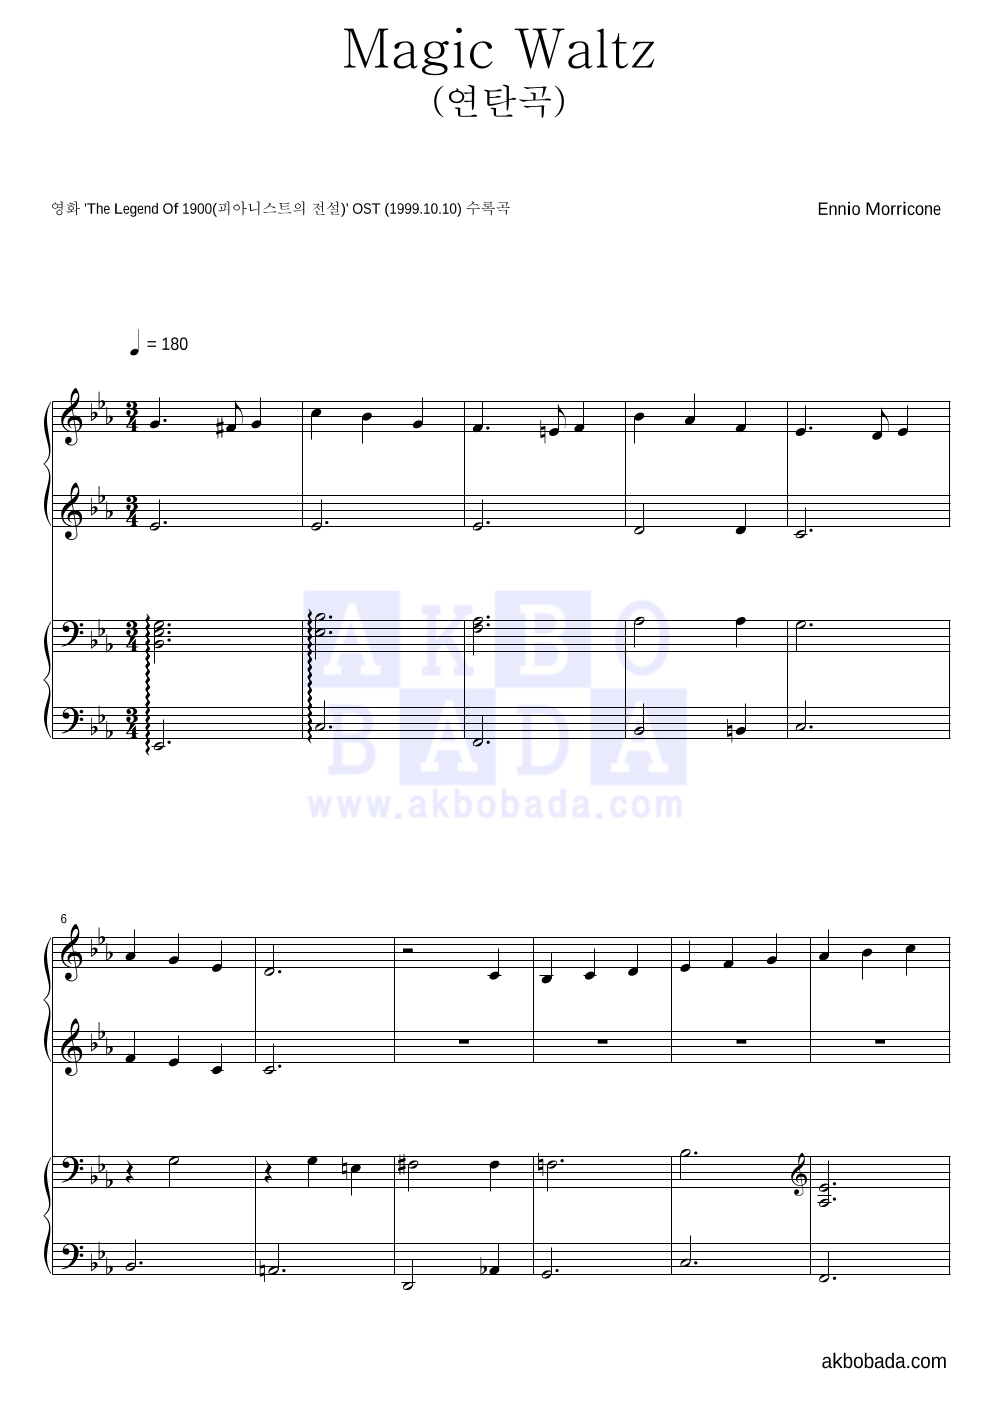 Ennio Morricone - Magic Waltz 연탄곡 악보